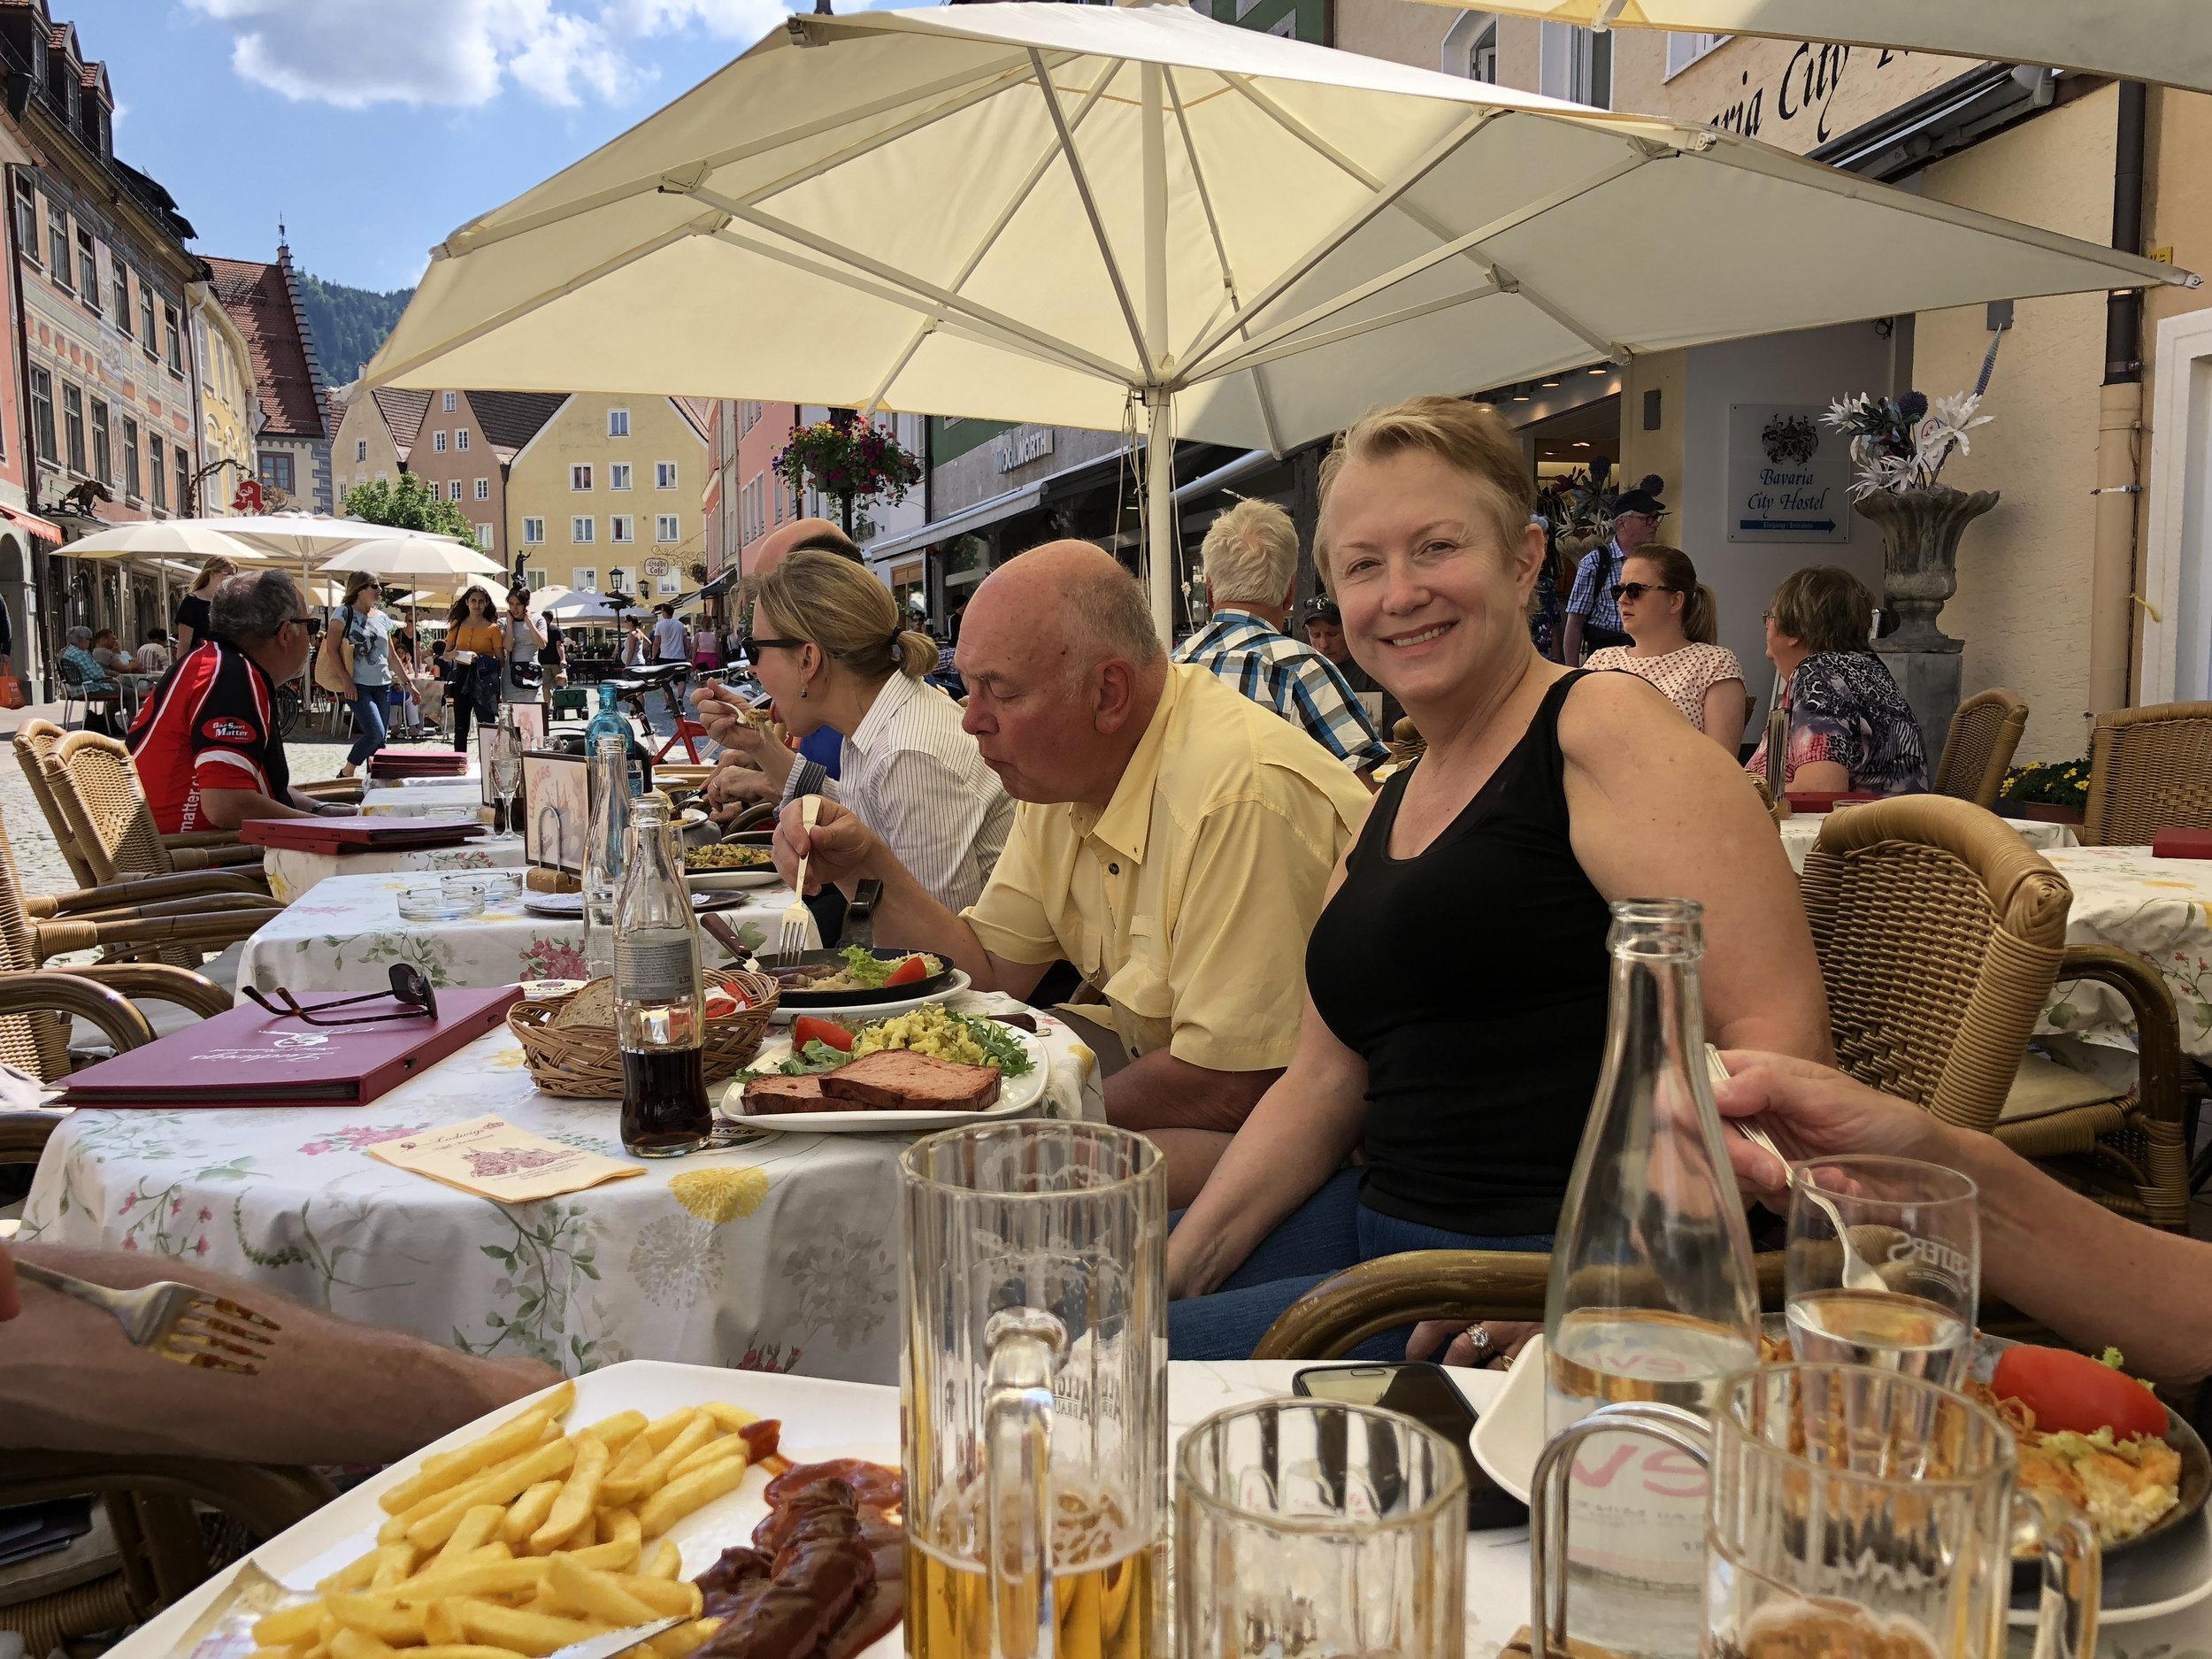 Teri_Day2_Castles_Germany&Austria_spiritedtable_photo49.jpg